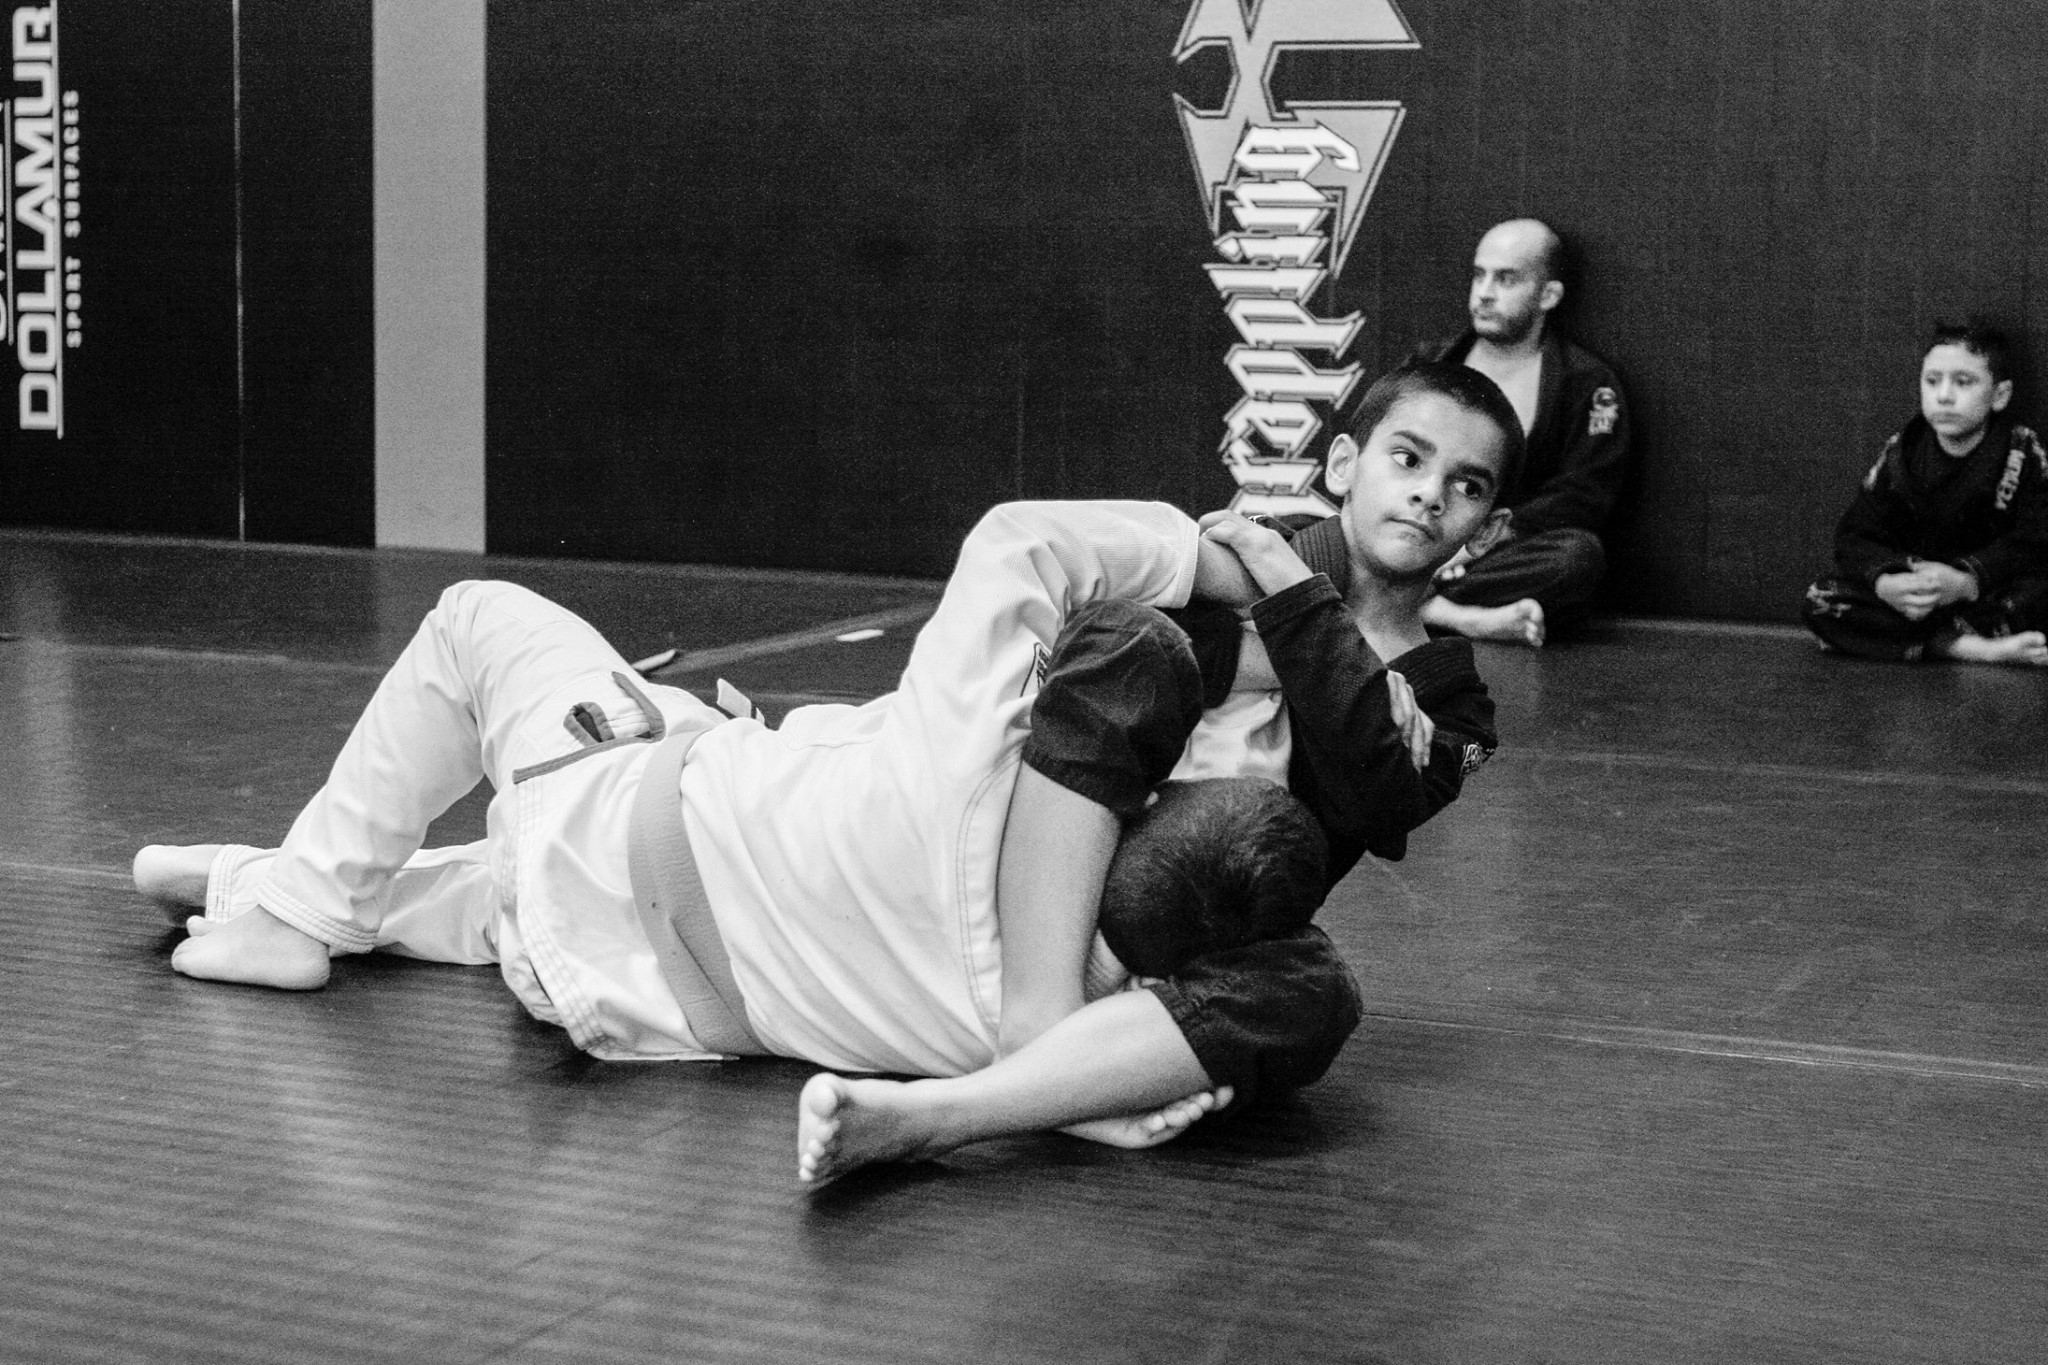 Kid's Jiu-Jitsu classes